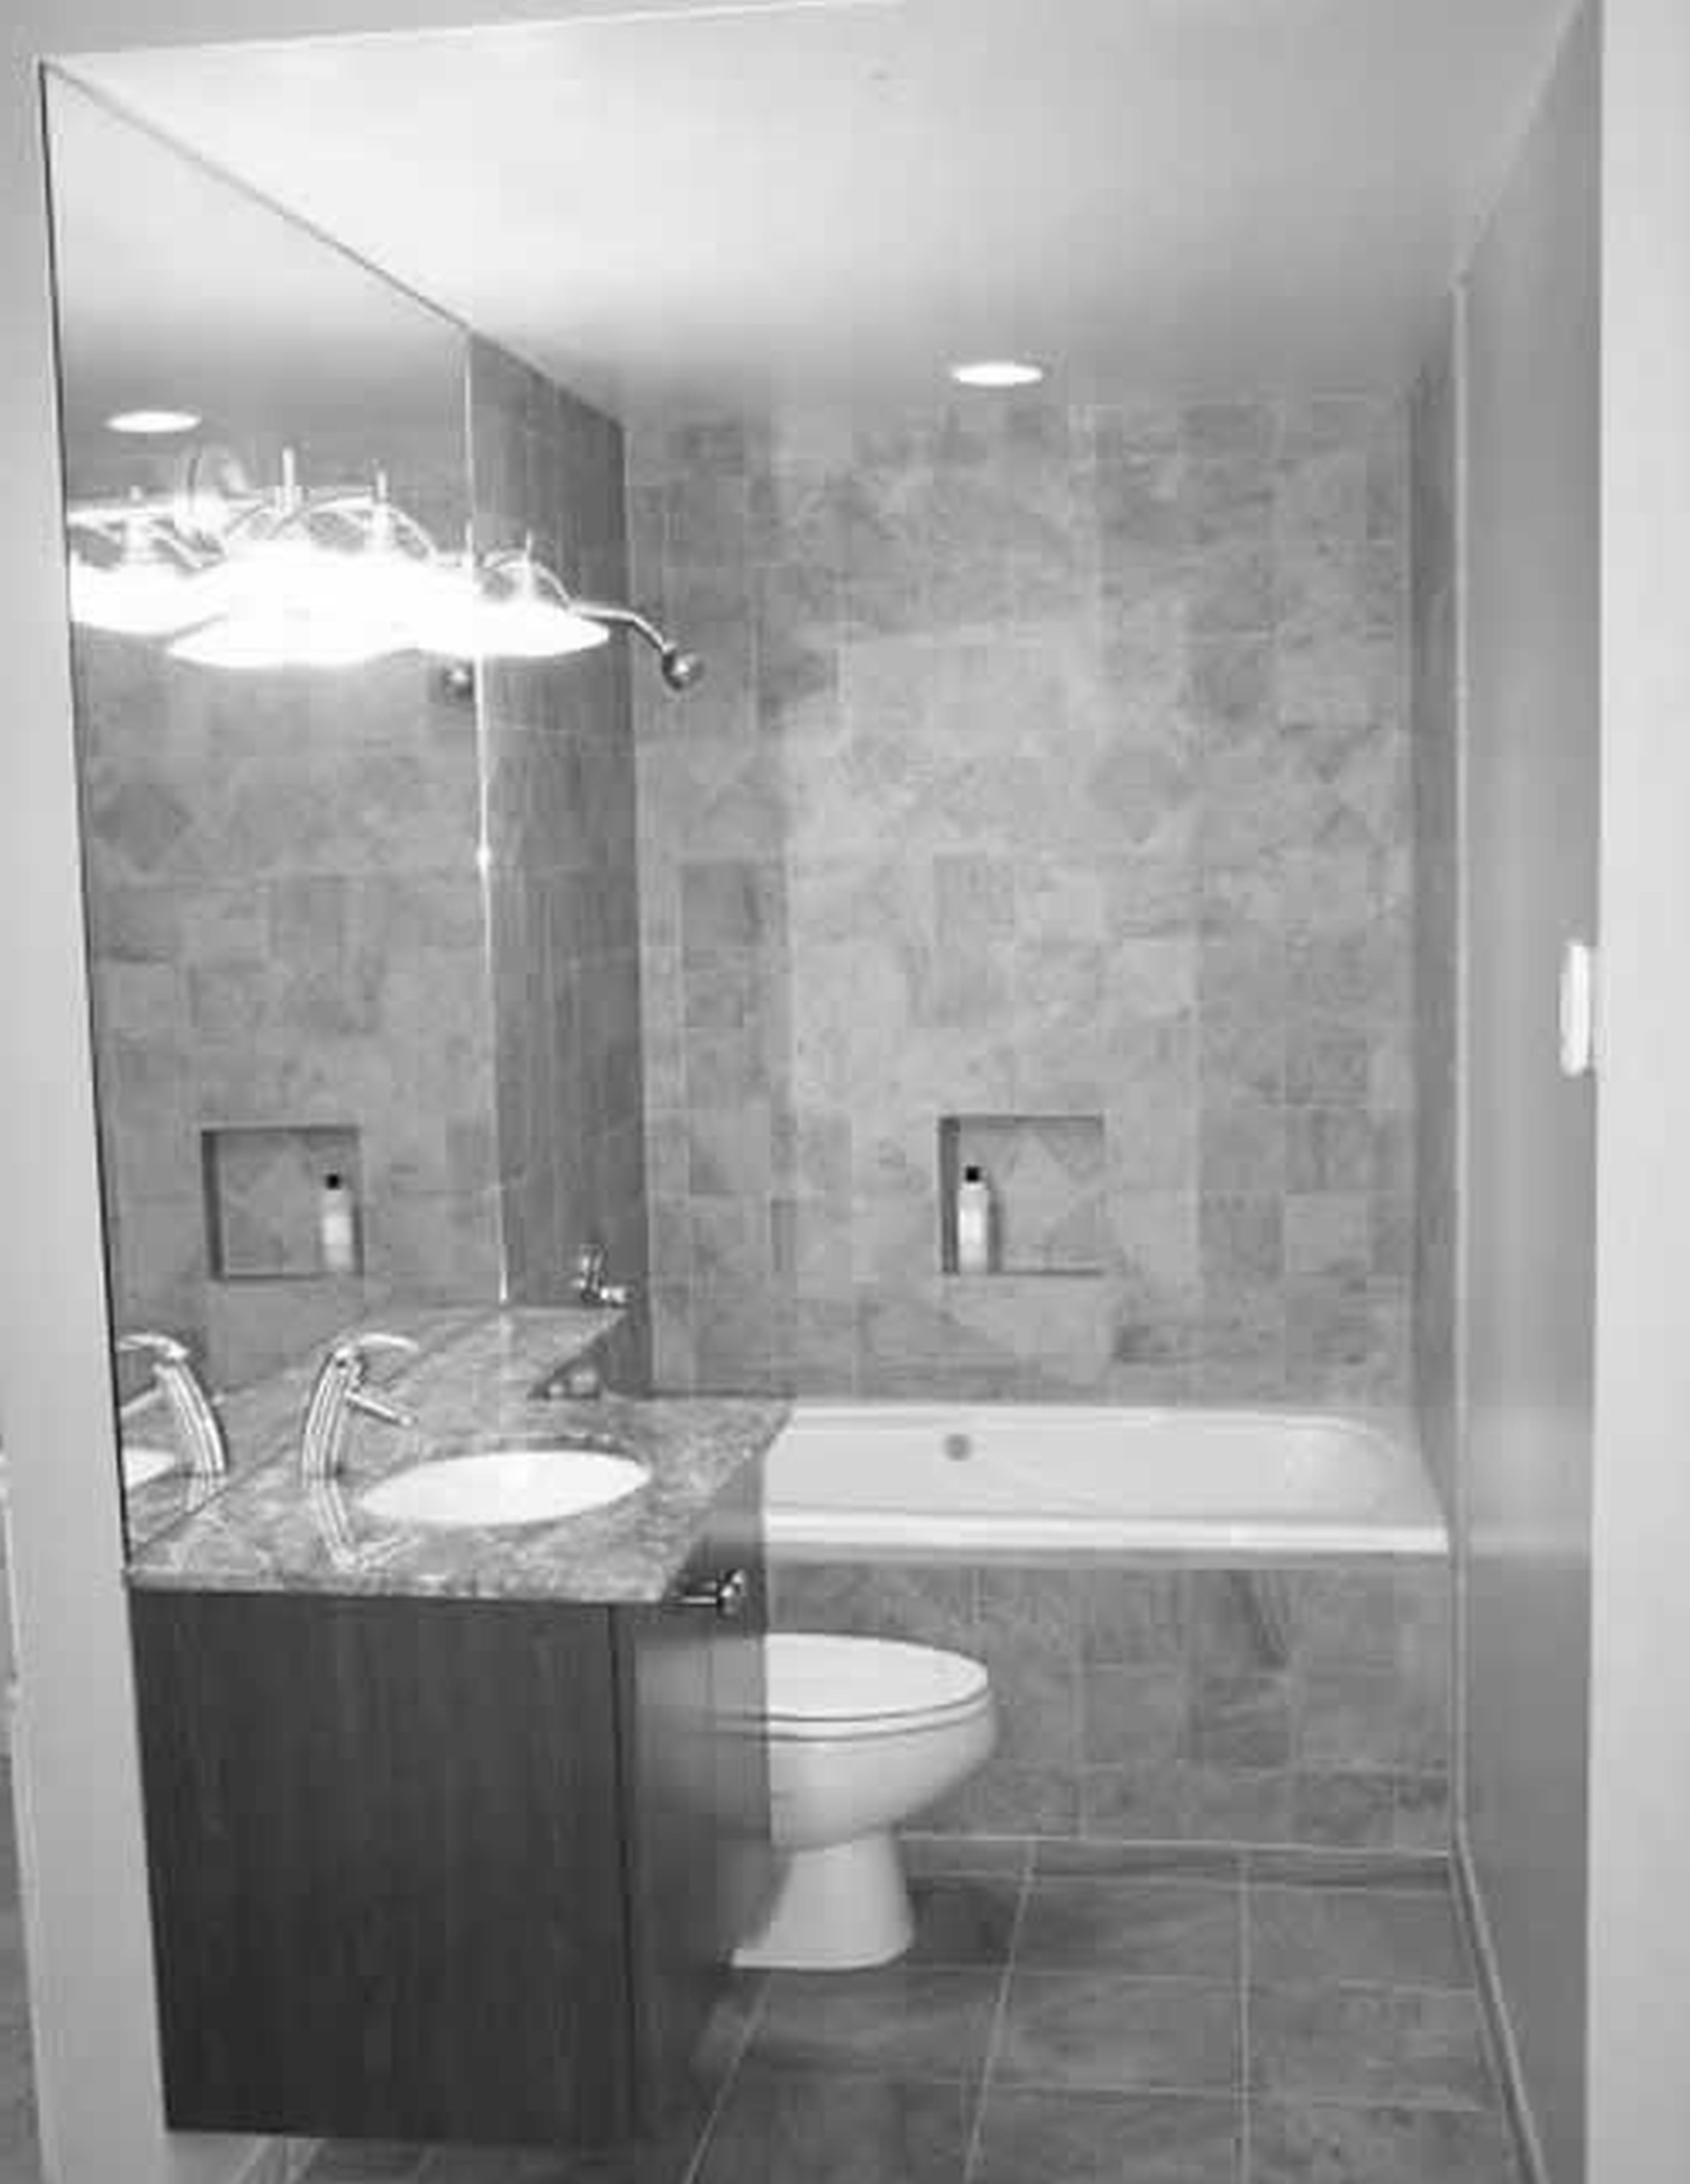 The Best Luxury Small Bathroom Tiles Design Philippines Ij06jke Https Ijcar 2016 Info L Small Bathroom Remodel Small Bathroom Renovations Home Depot Bathroom